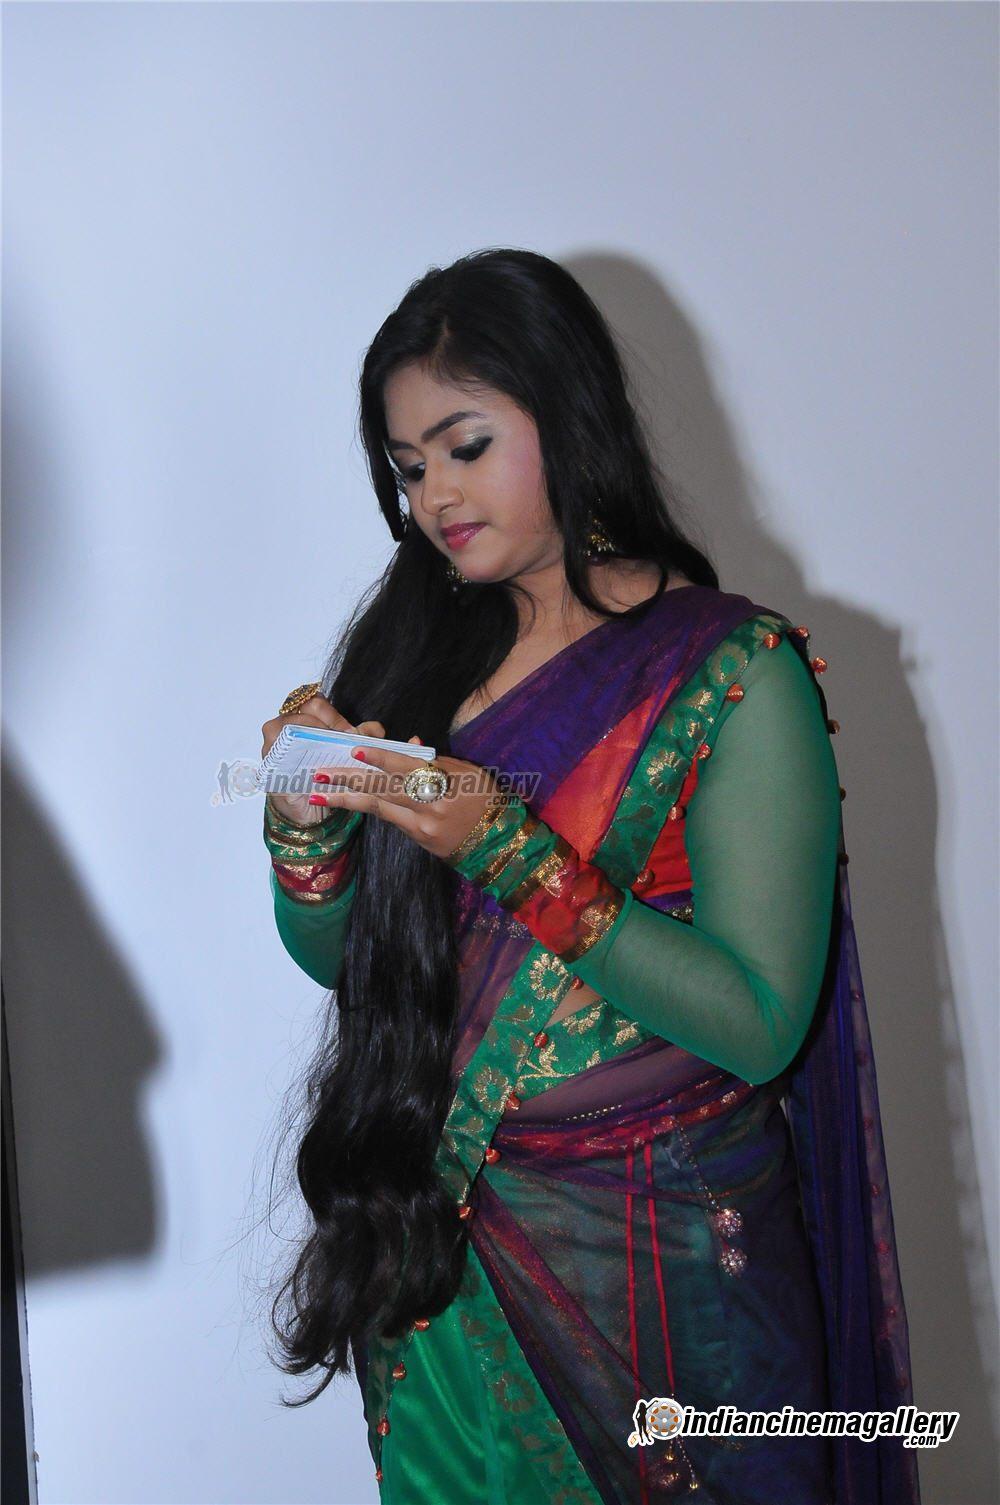 Indian pron star sex video-2156